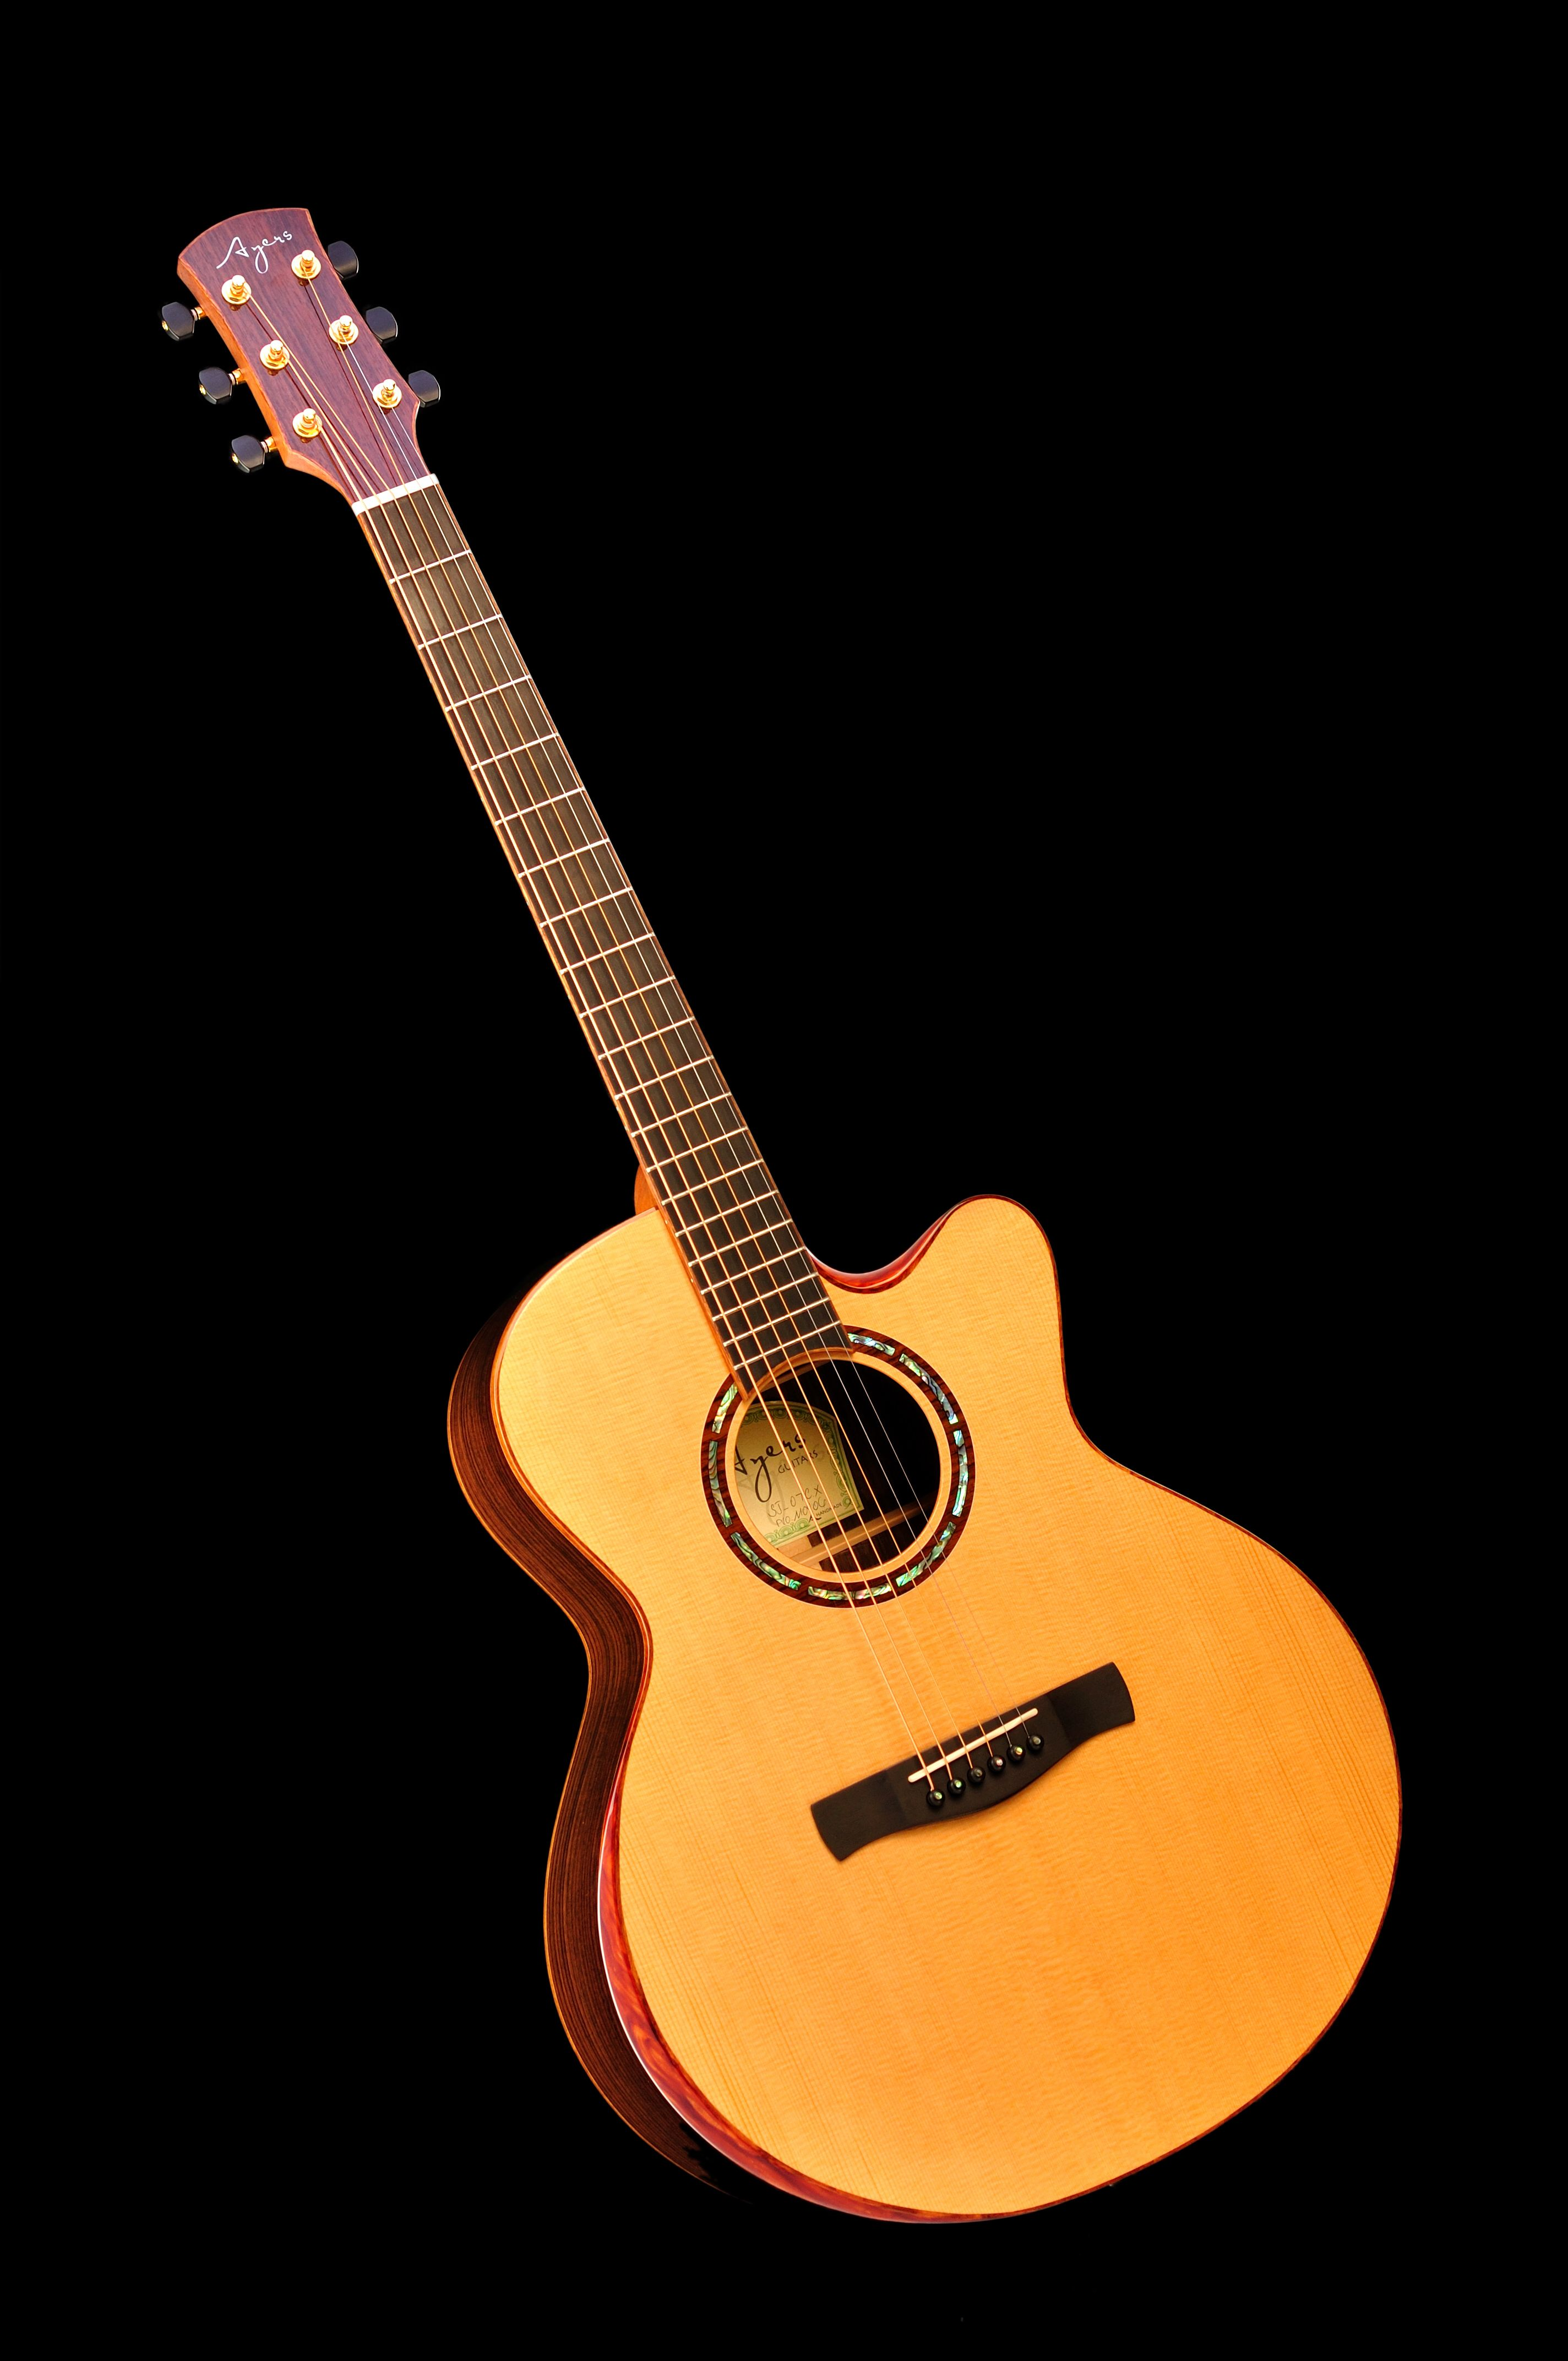 Ayers Guitar Canada Premium Series 07 SJ-07CX Small Jumbo with ...